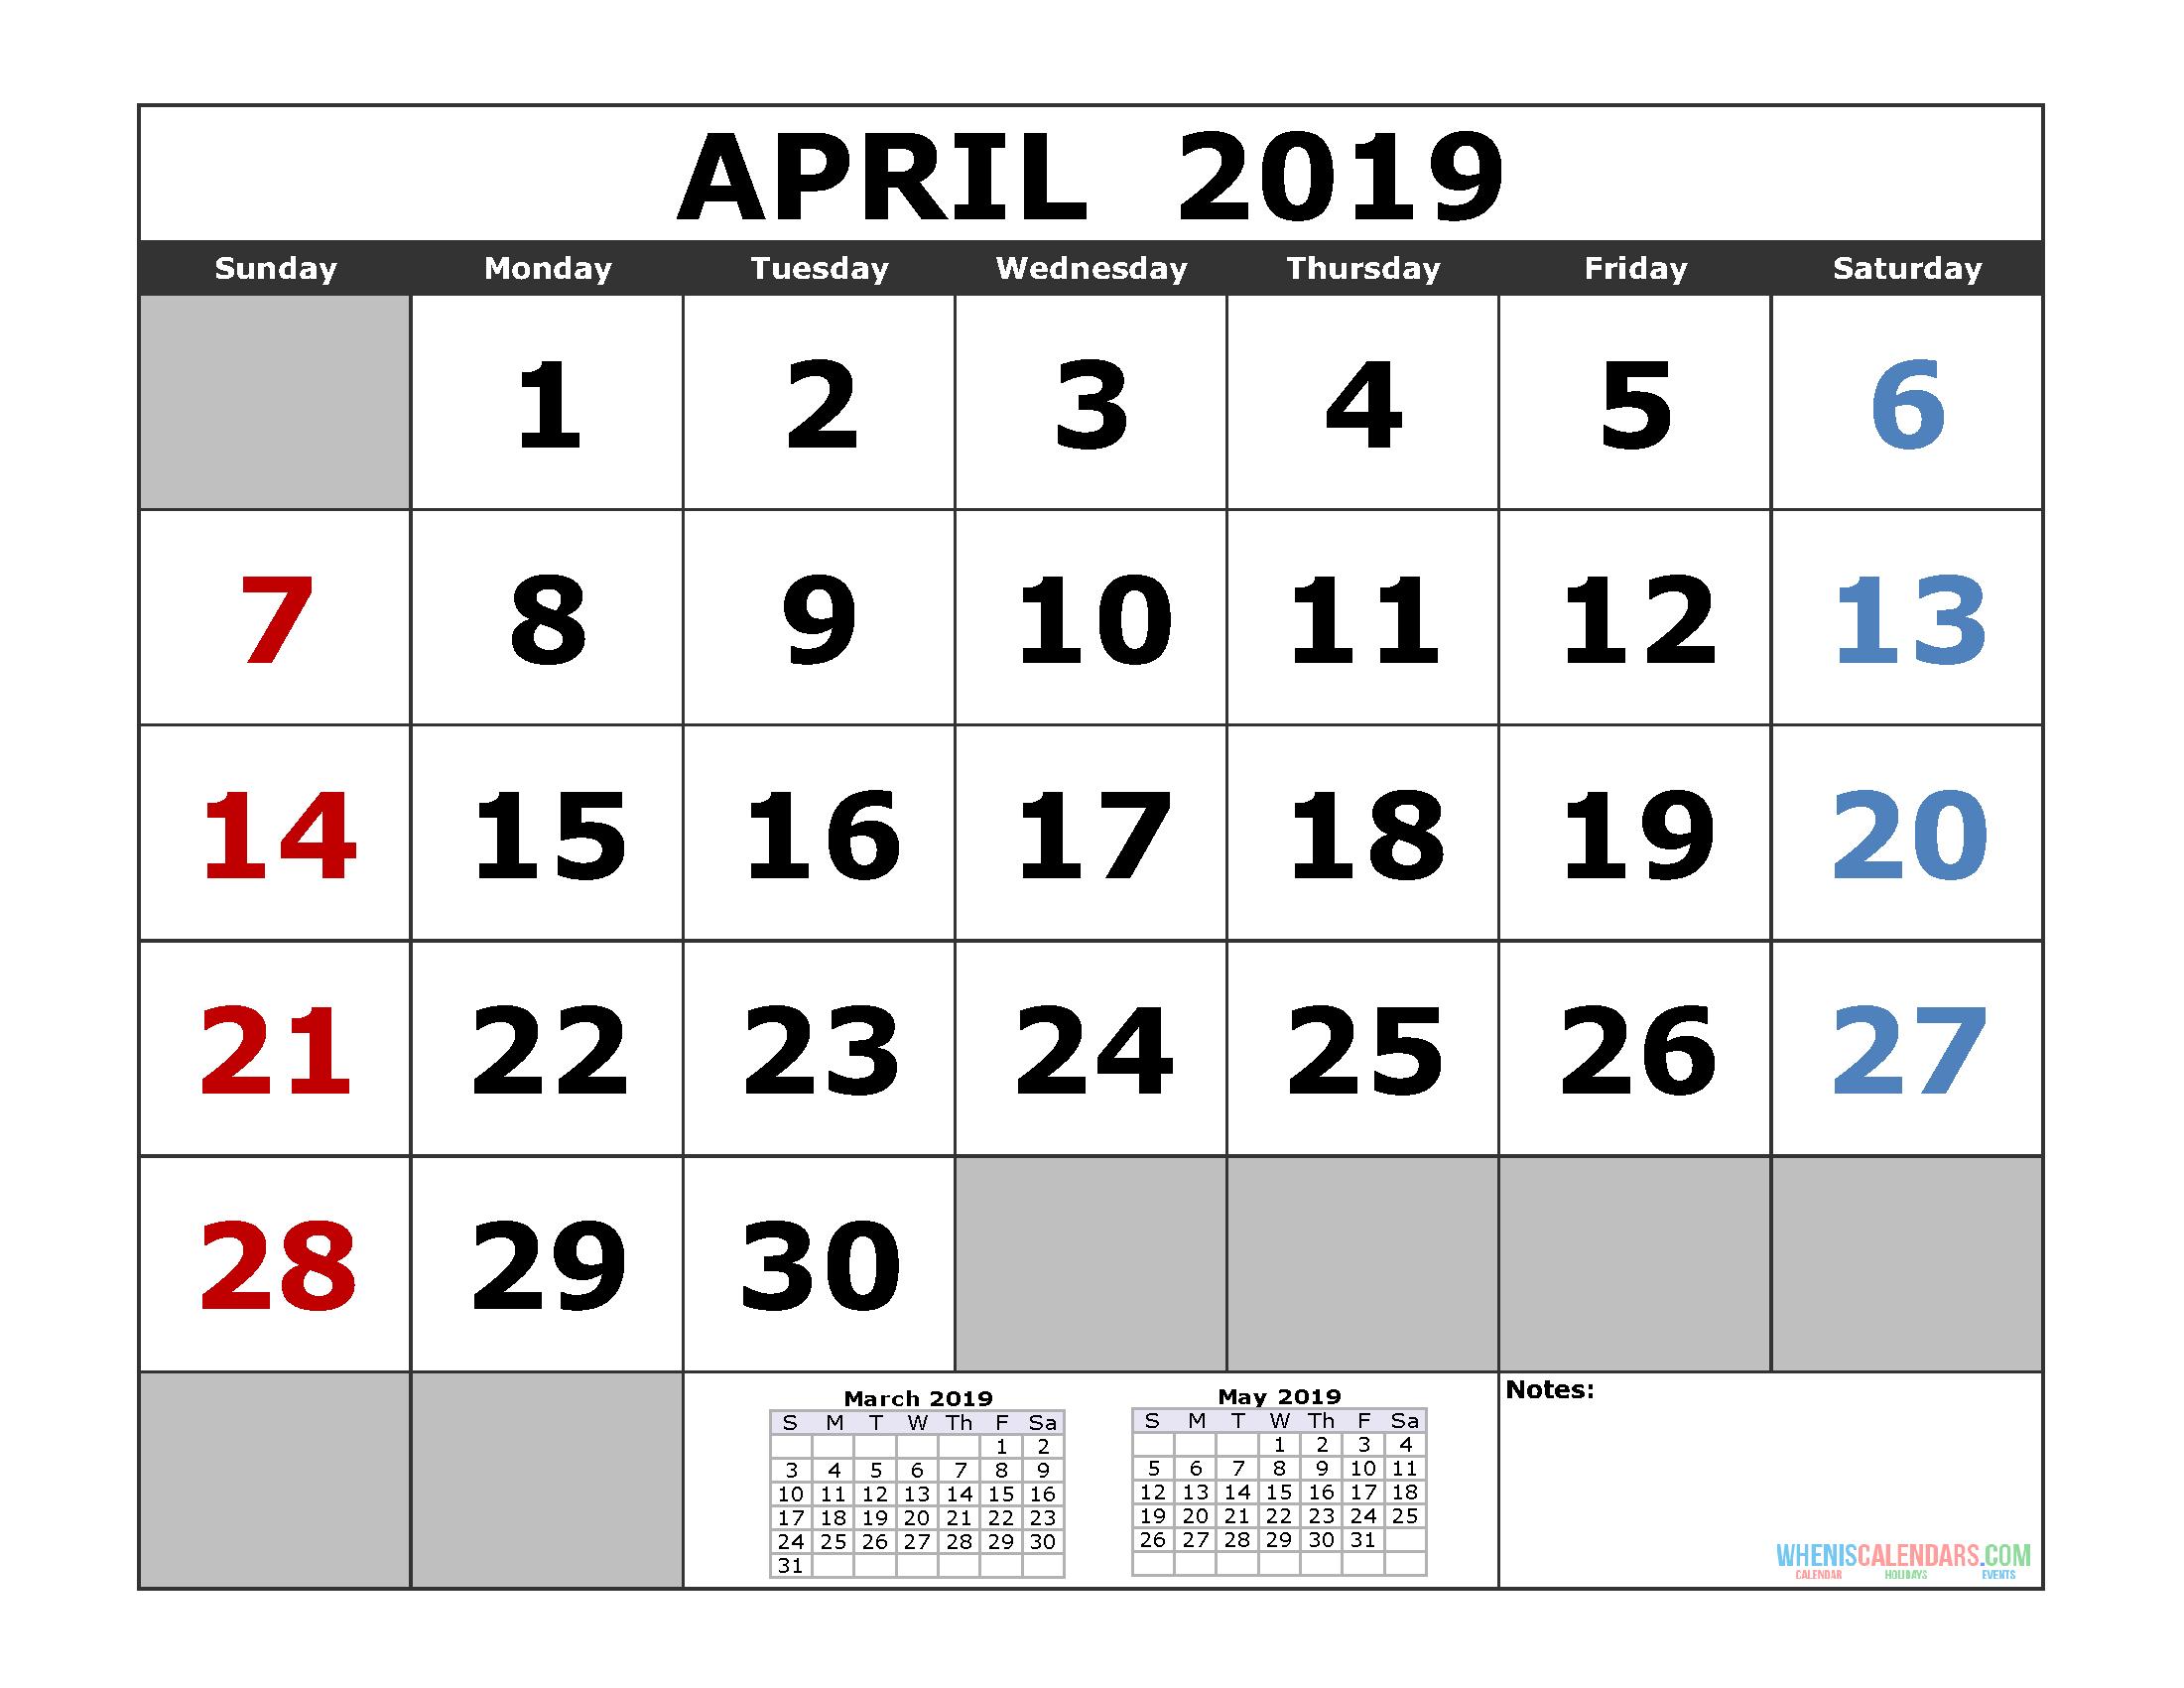 Free April 2019 Printable Calendar Templates [Us. Edition